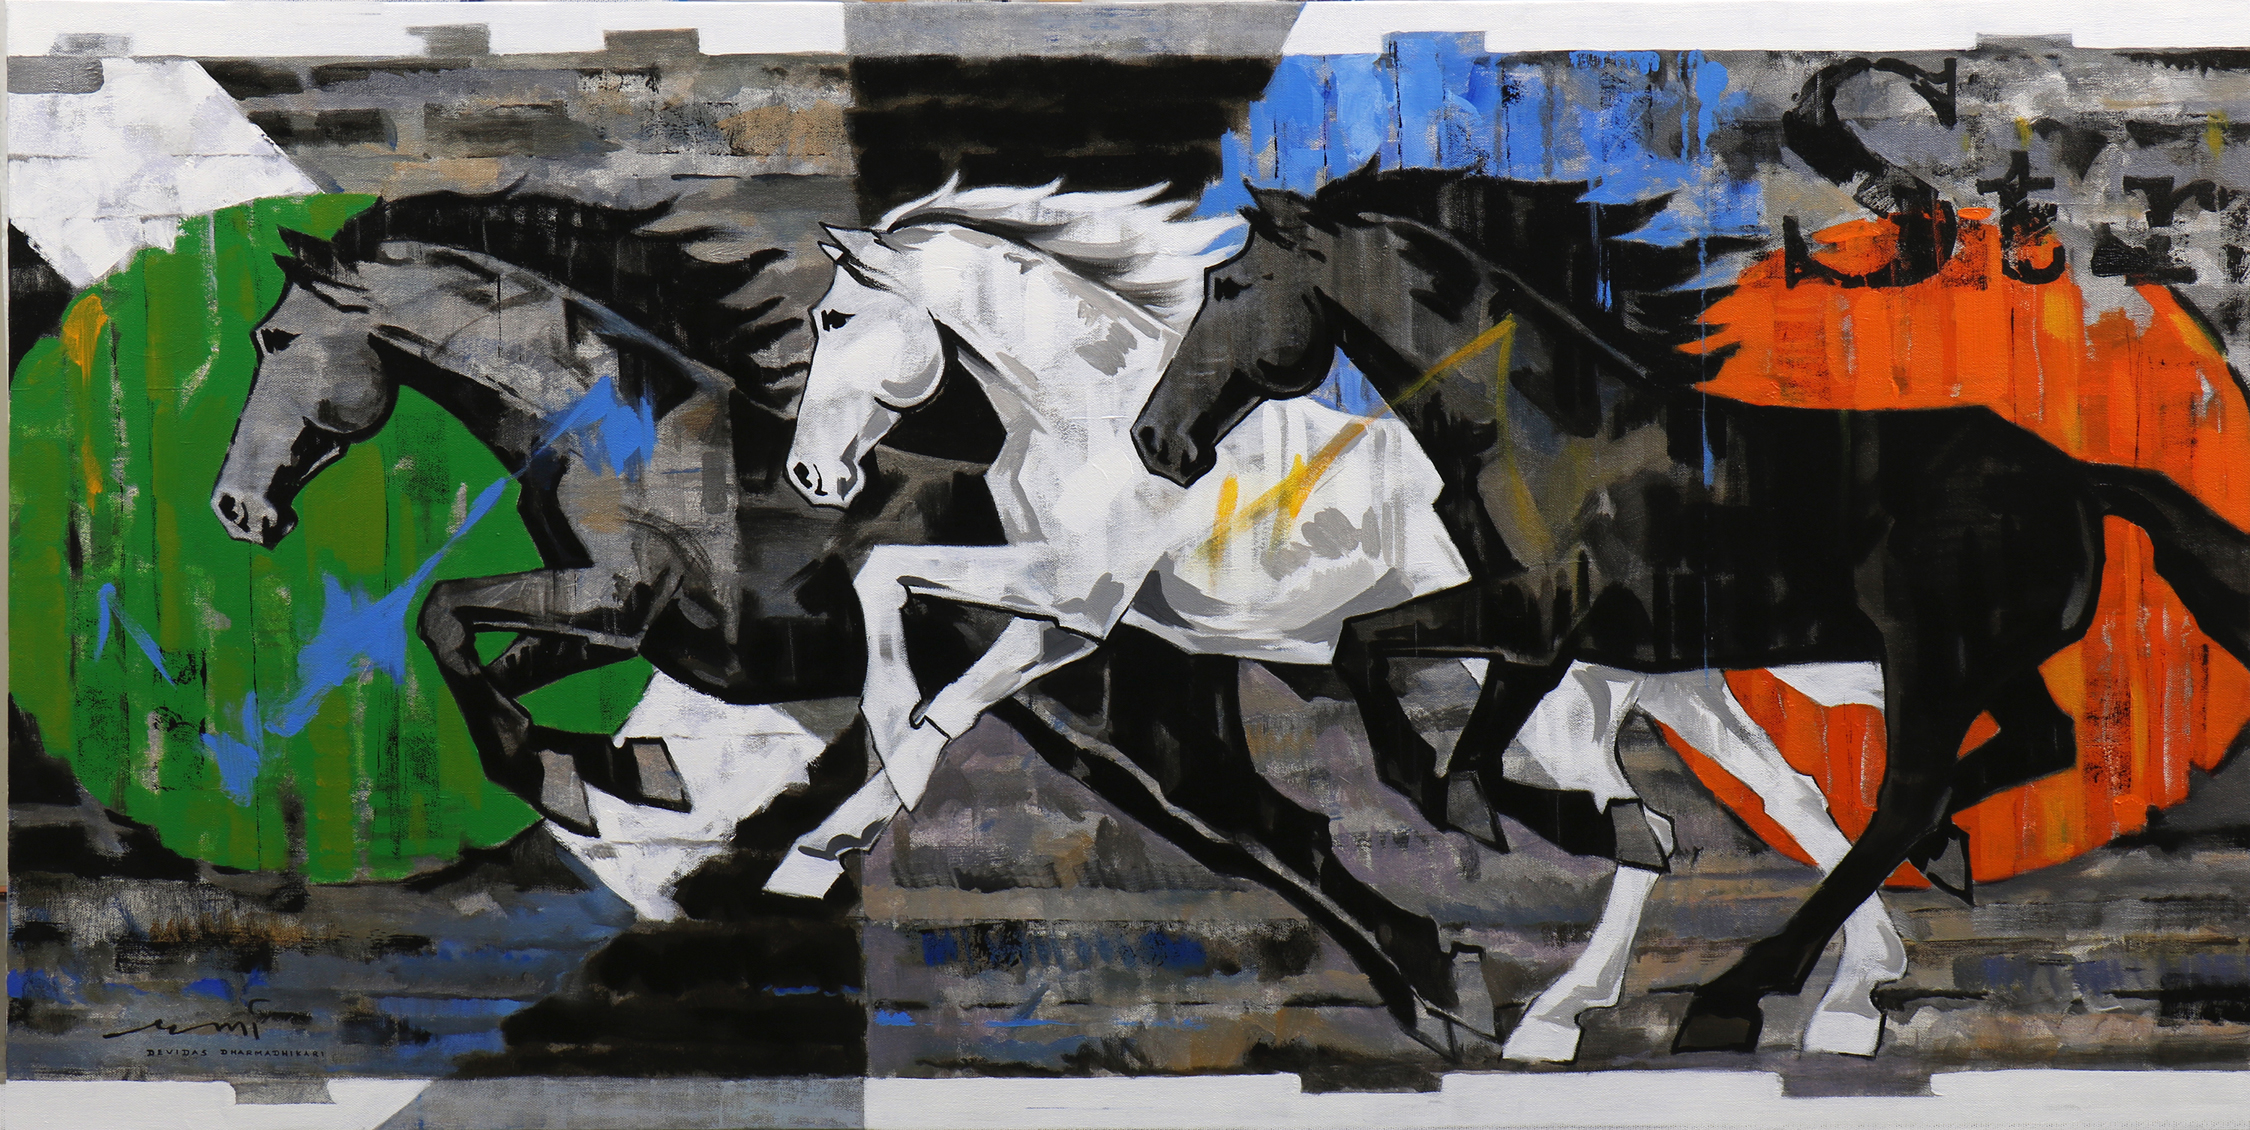 HORSE-173, Acrylic on canvas, Size- 72x36